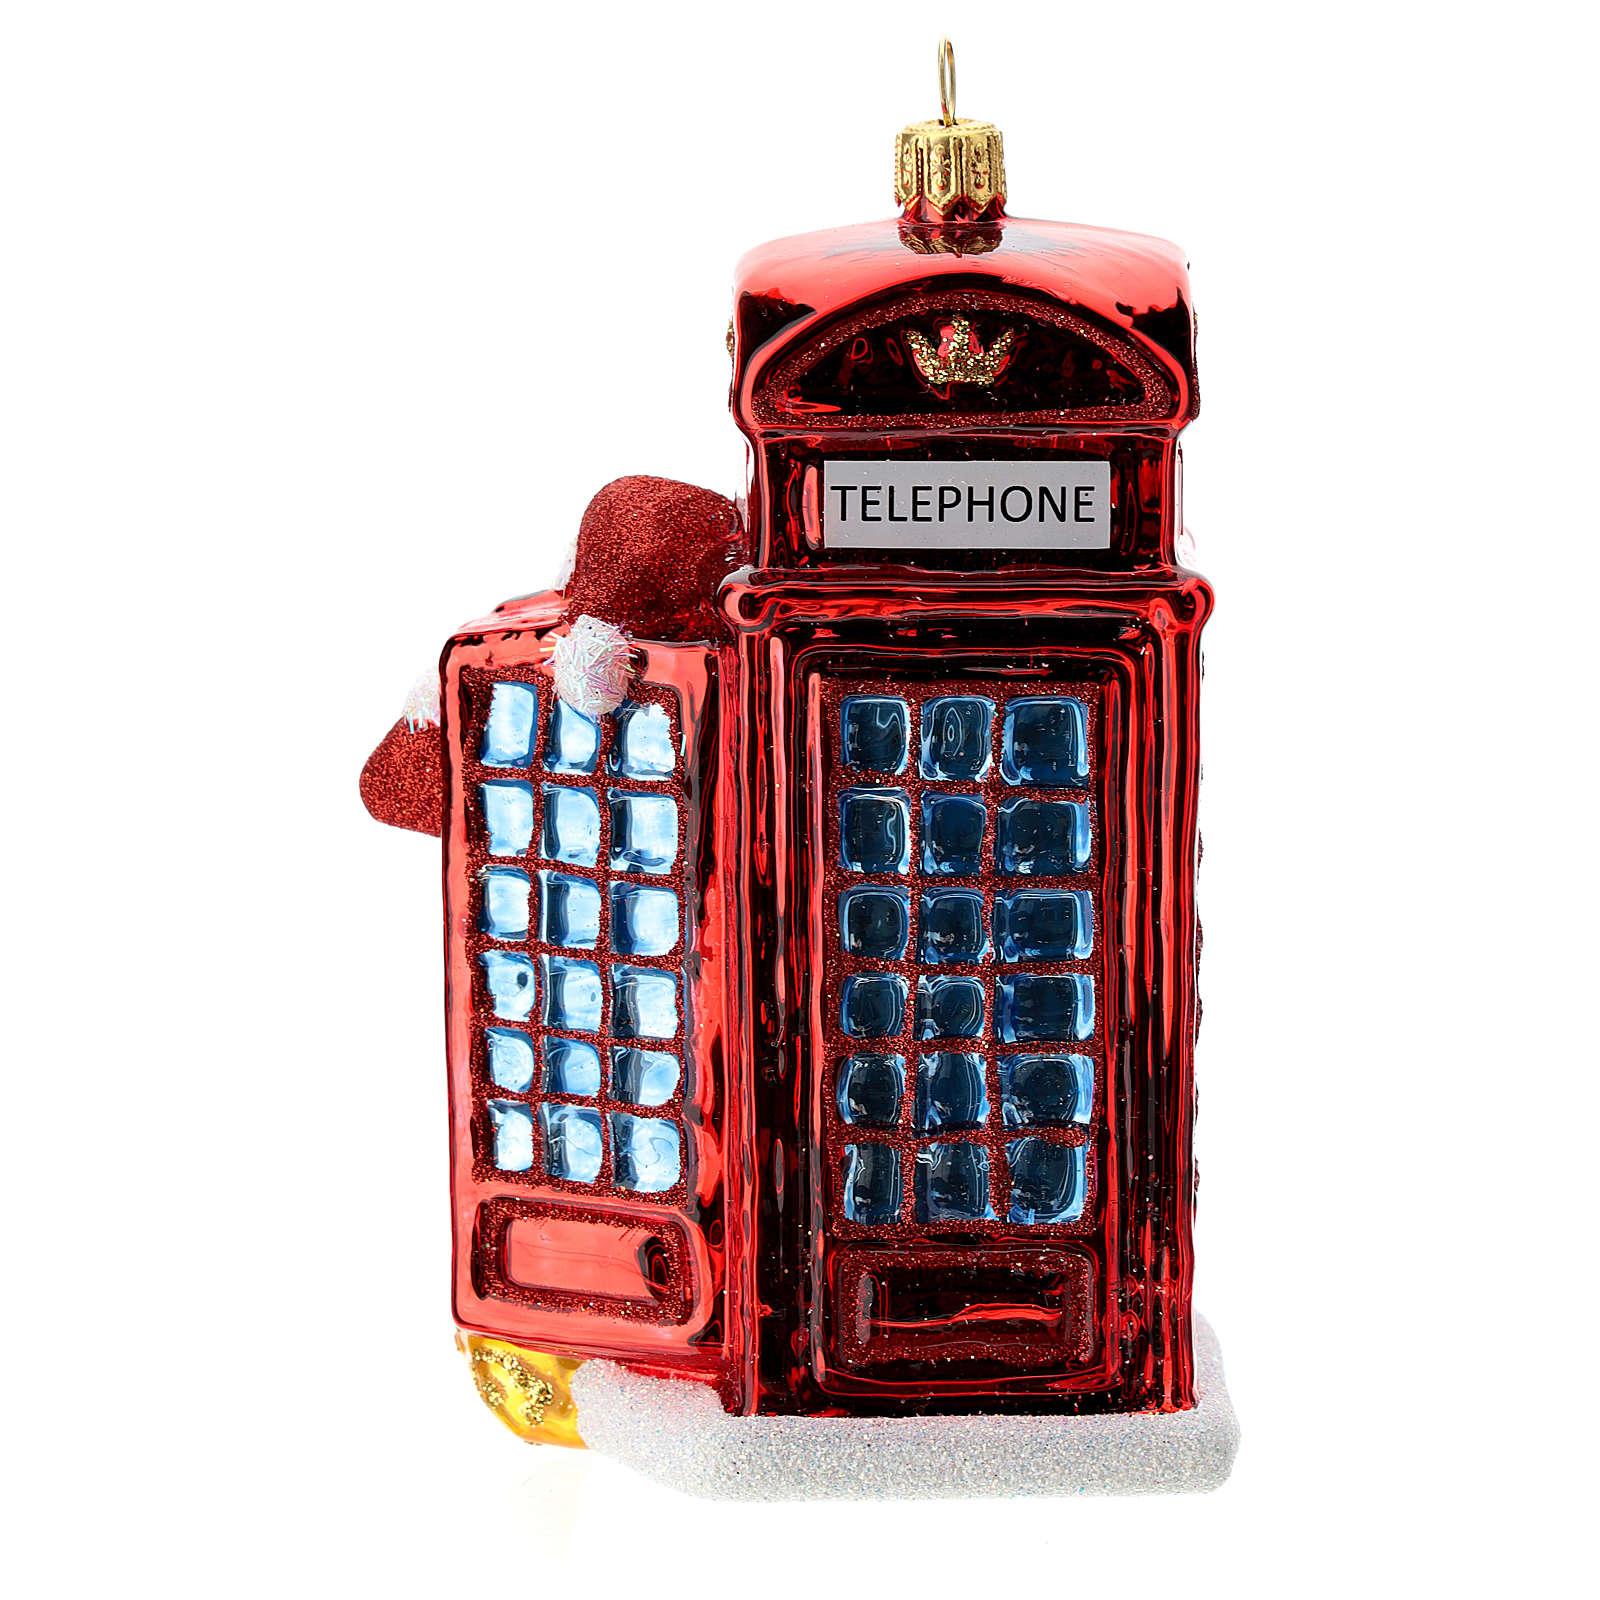 Babbo Natale cabina telefonica londinese addobbo vetro soffiato 4